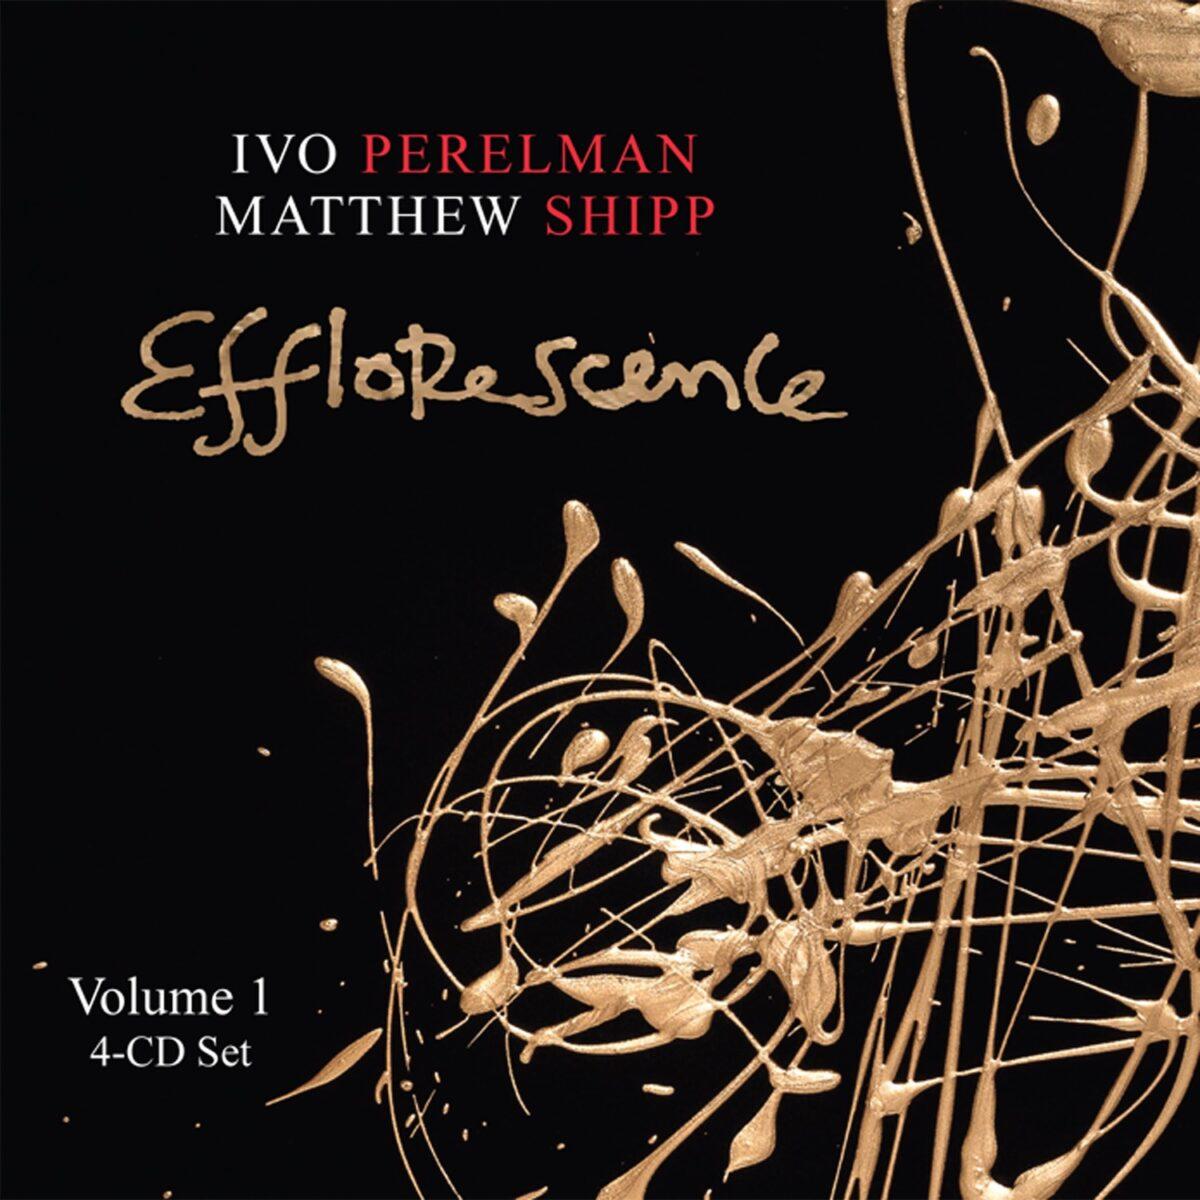 Ivo_Shipp_Efflorescence_cover copy